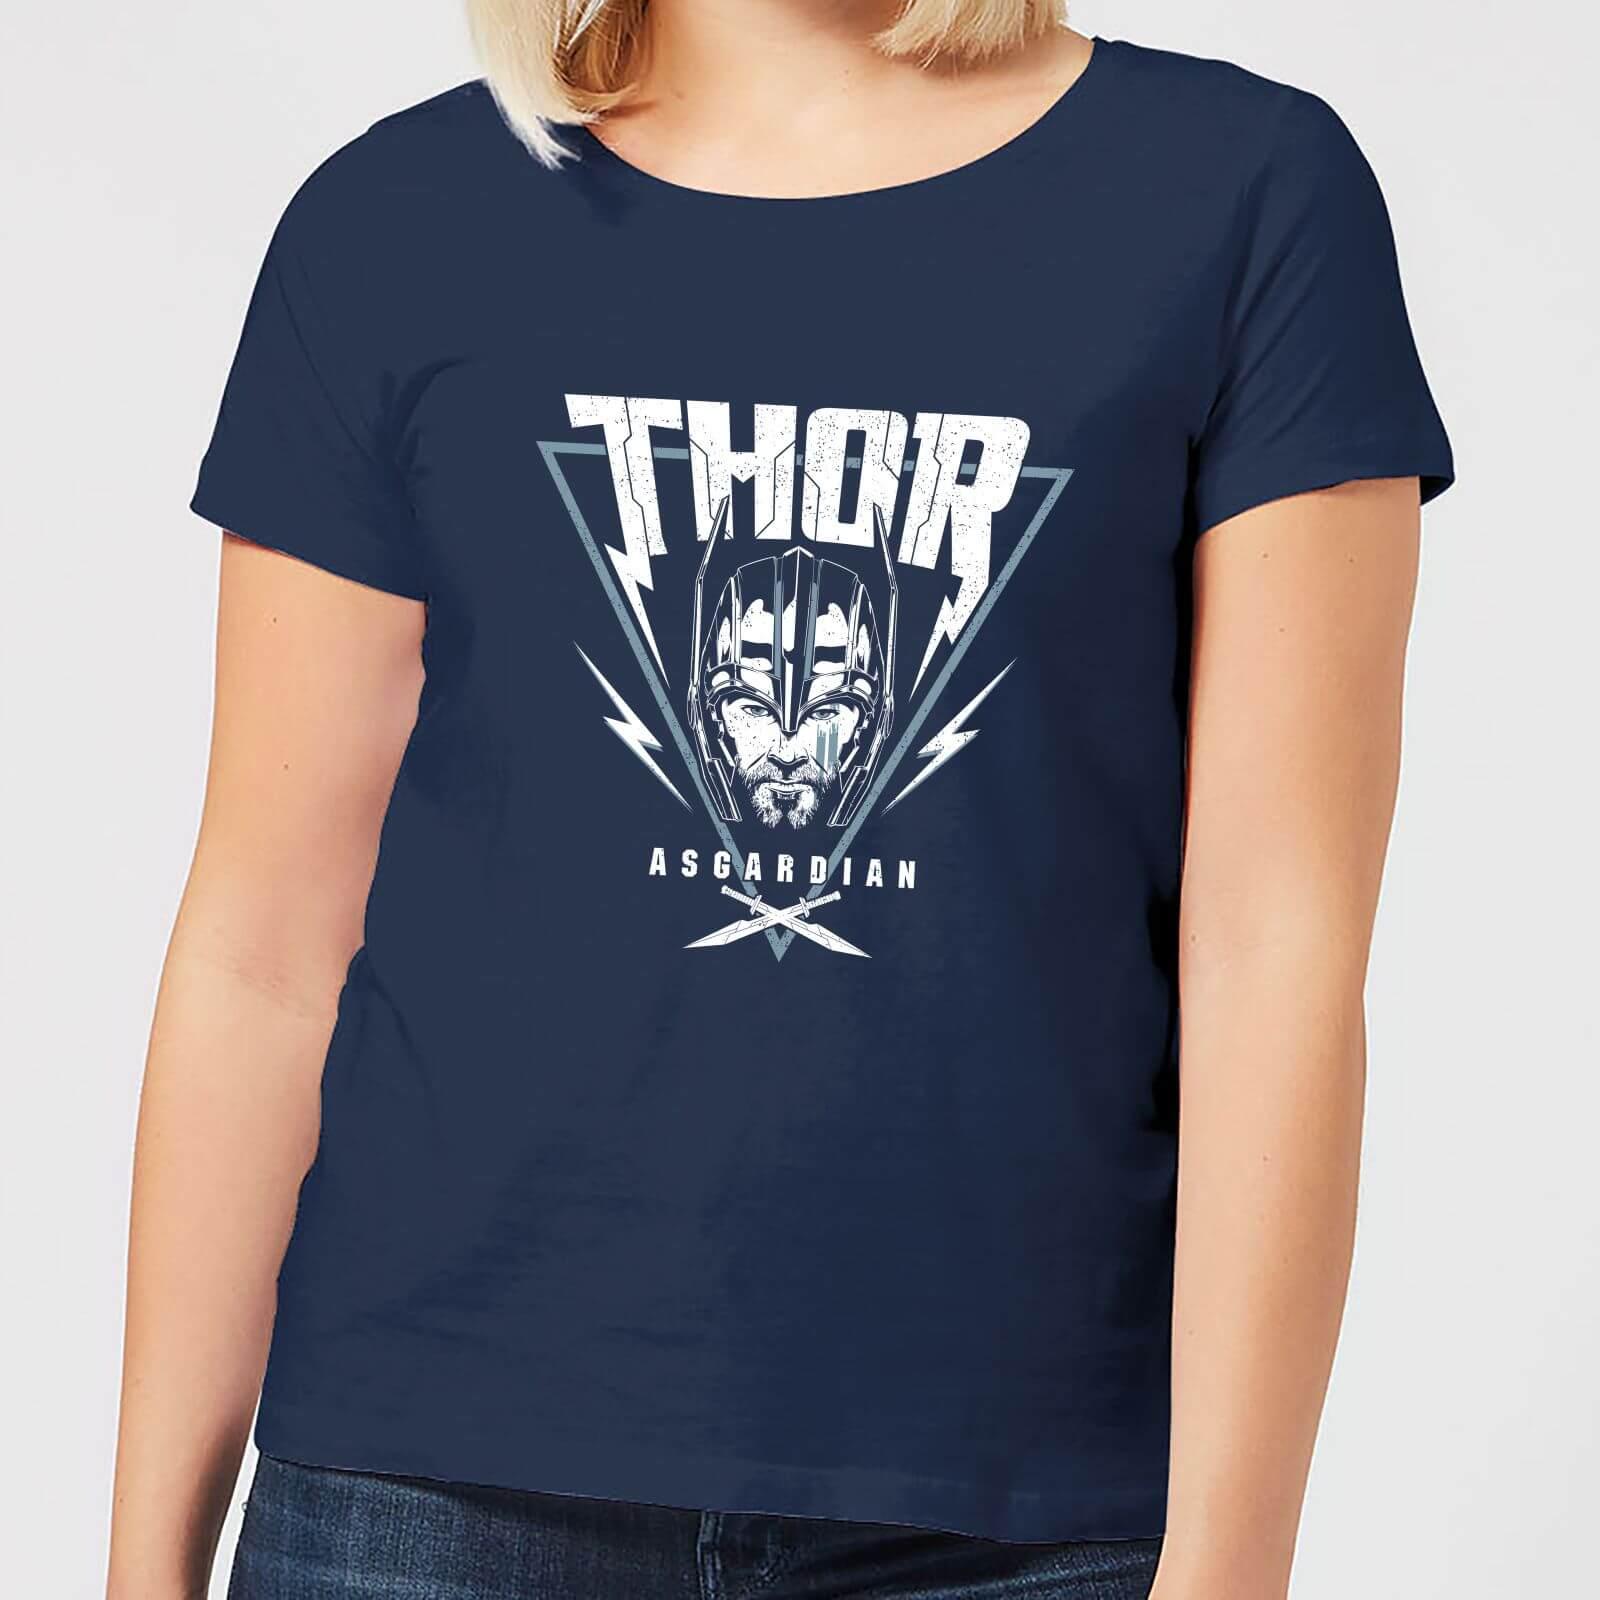 OfferteWeb.click 82-t-shirt-marvel-thor-ragnarok-asgardian-triangle-navy